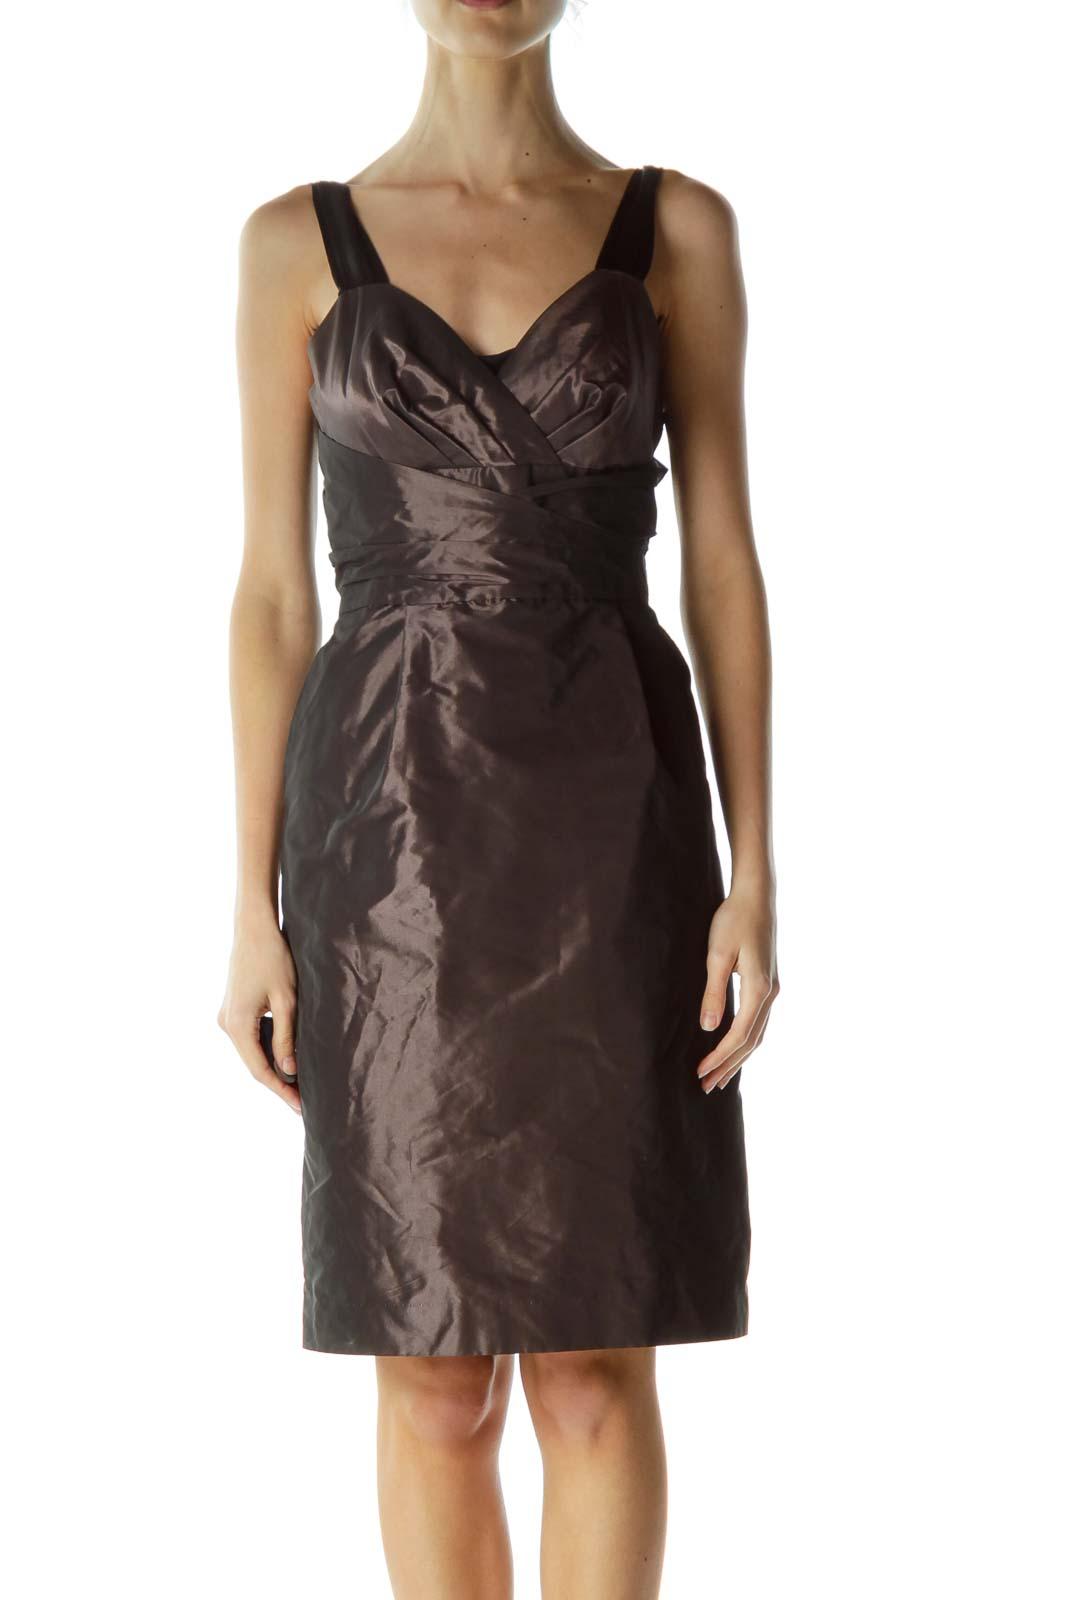 Purple Shiny Empire Waist Cocktail Dress